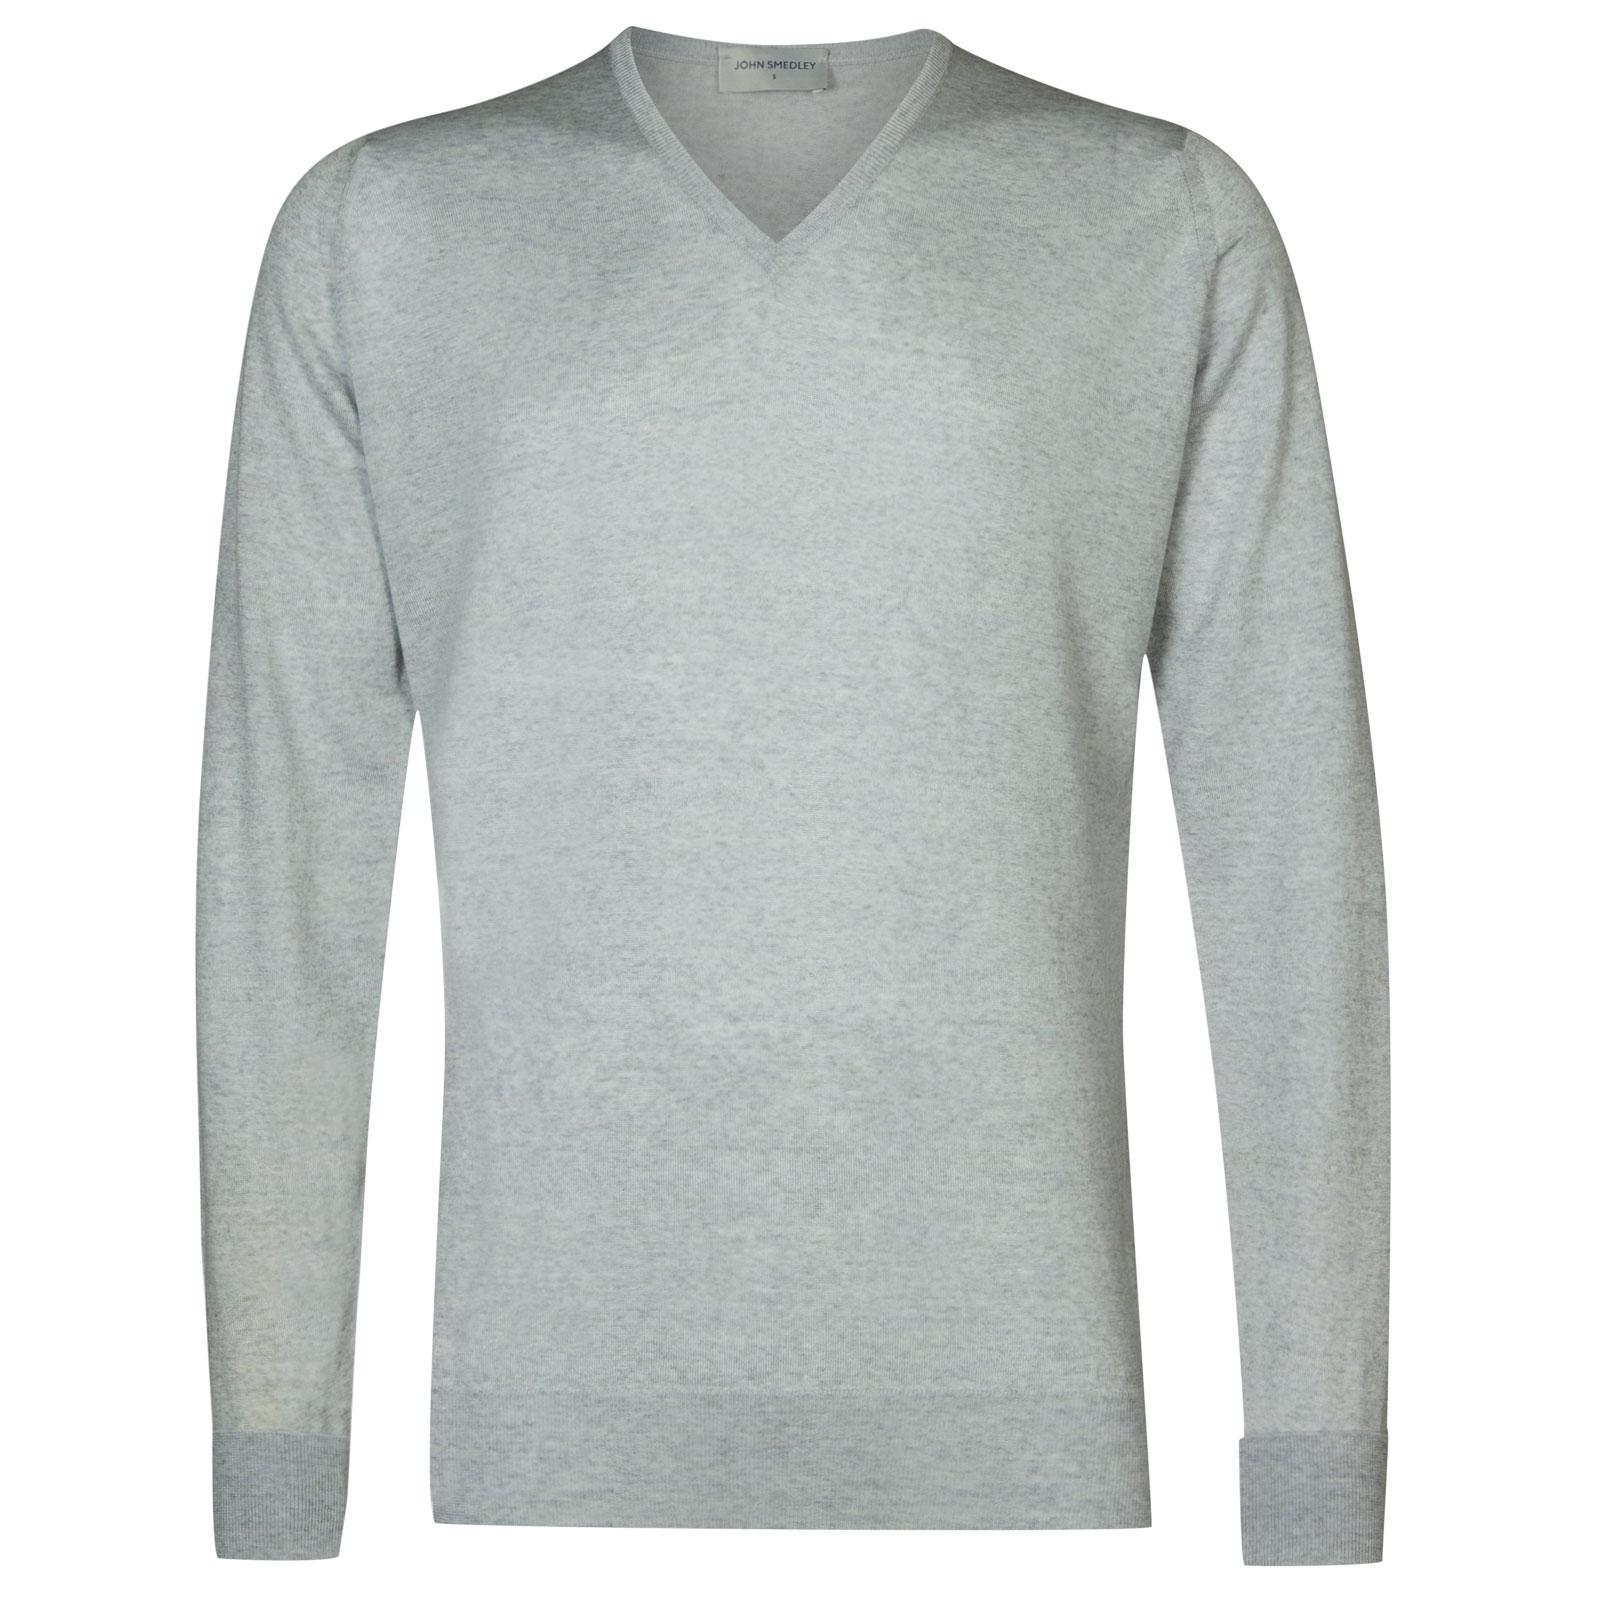 John Smedley bobby Merino Wool Pullover in Bardot Grey-S